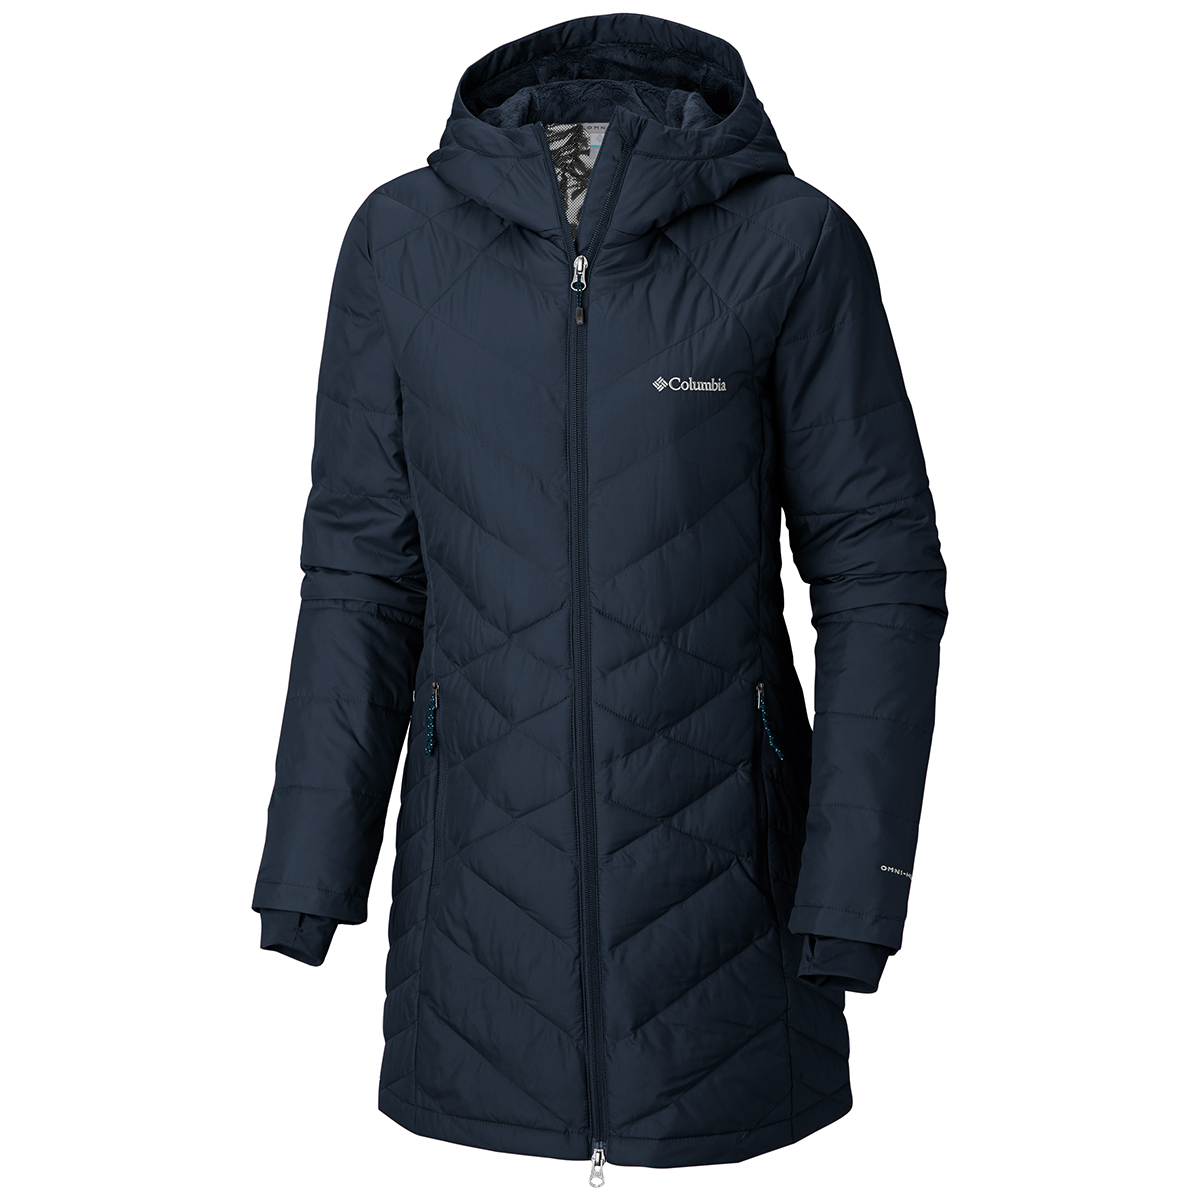 Columbia Women's Heavenly Long Hooded Jacket - Blue, S